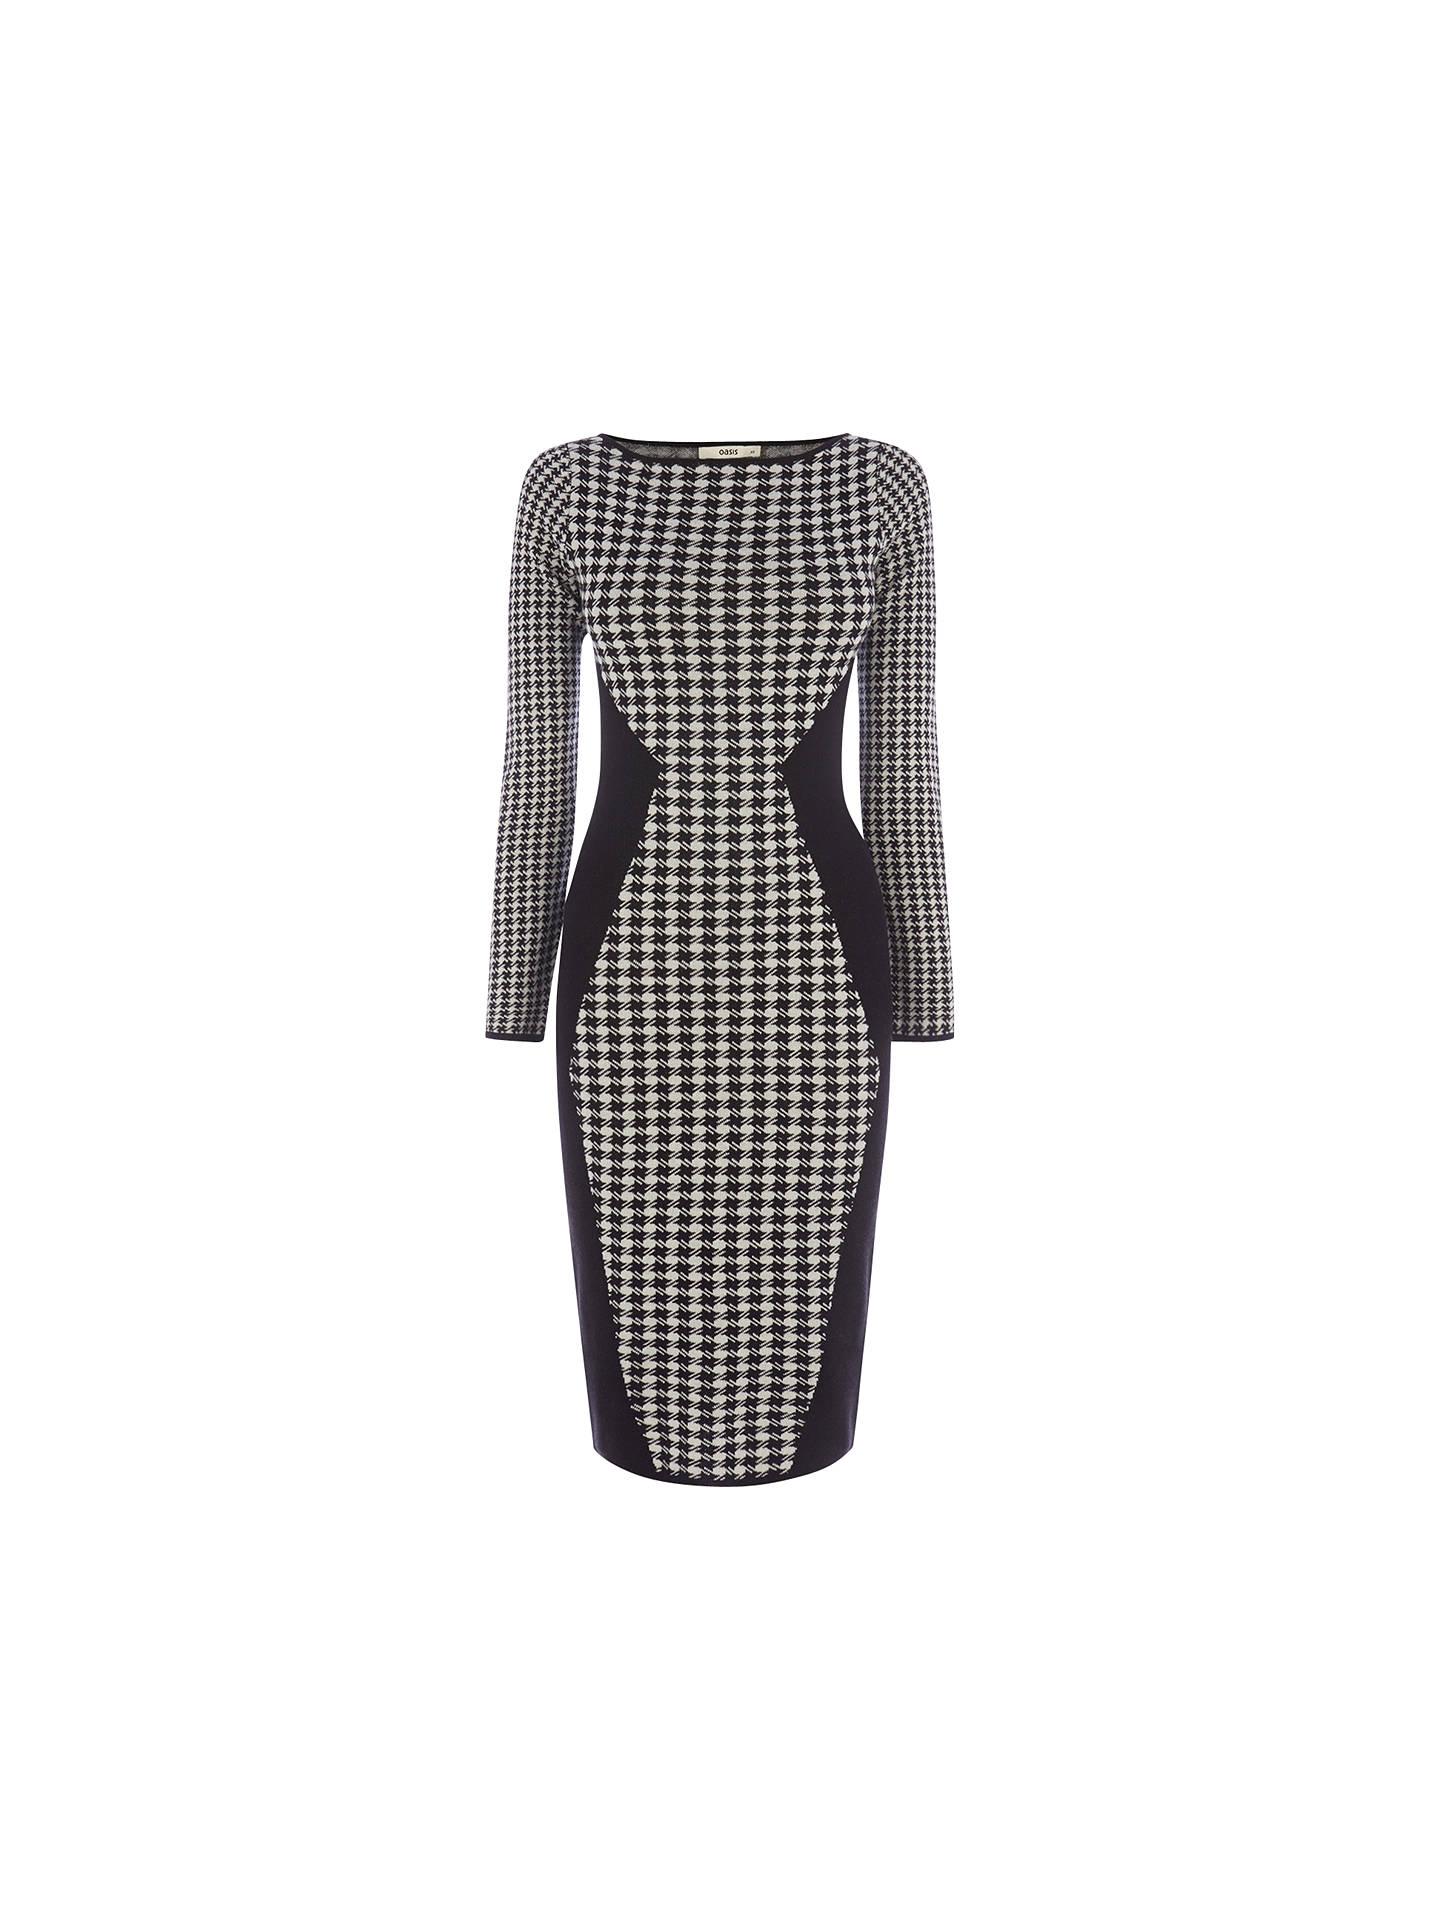 detailed look buy sale pre order Oasis Dogtooth Dress, Black/White at John Lewis & Partners